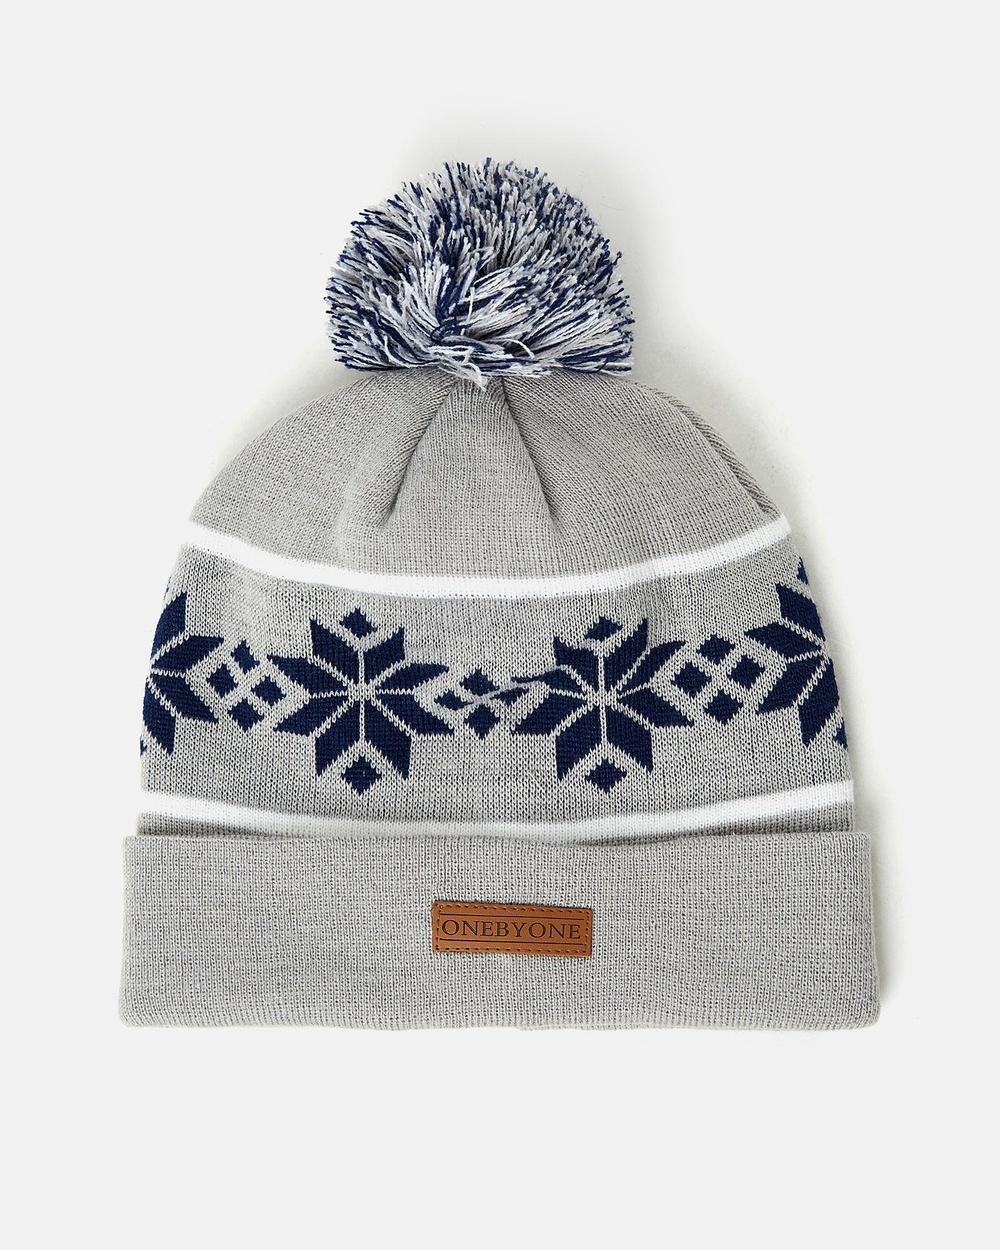 ONEBYONE Snow Leopard Beanie Headwear Marble Grey